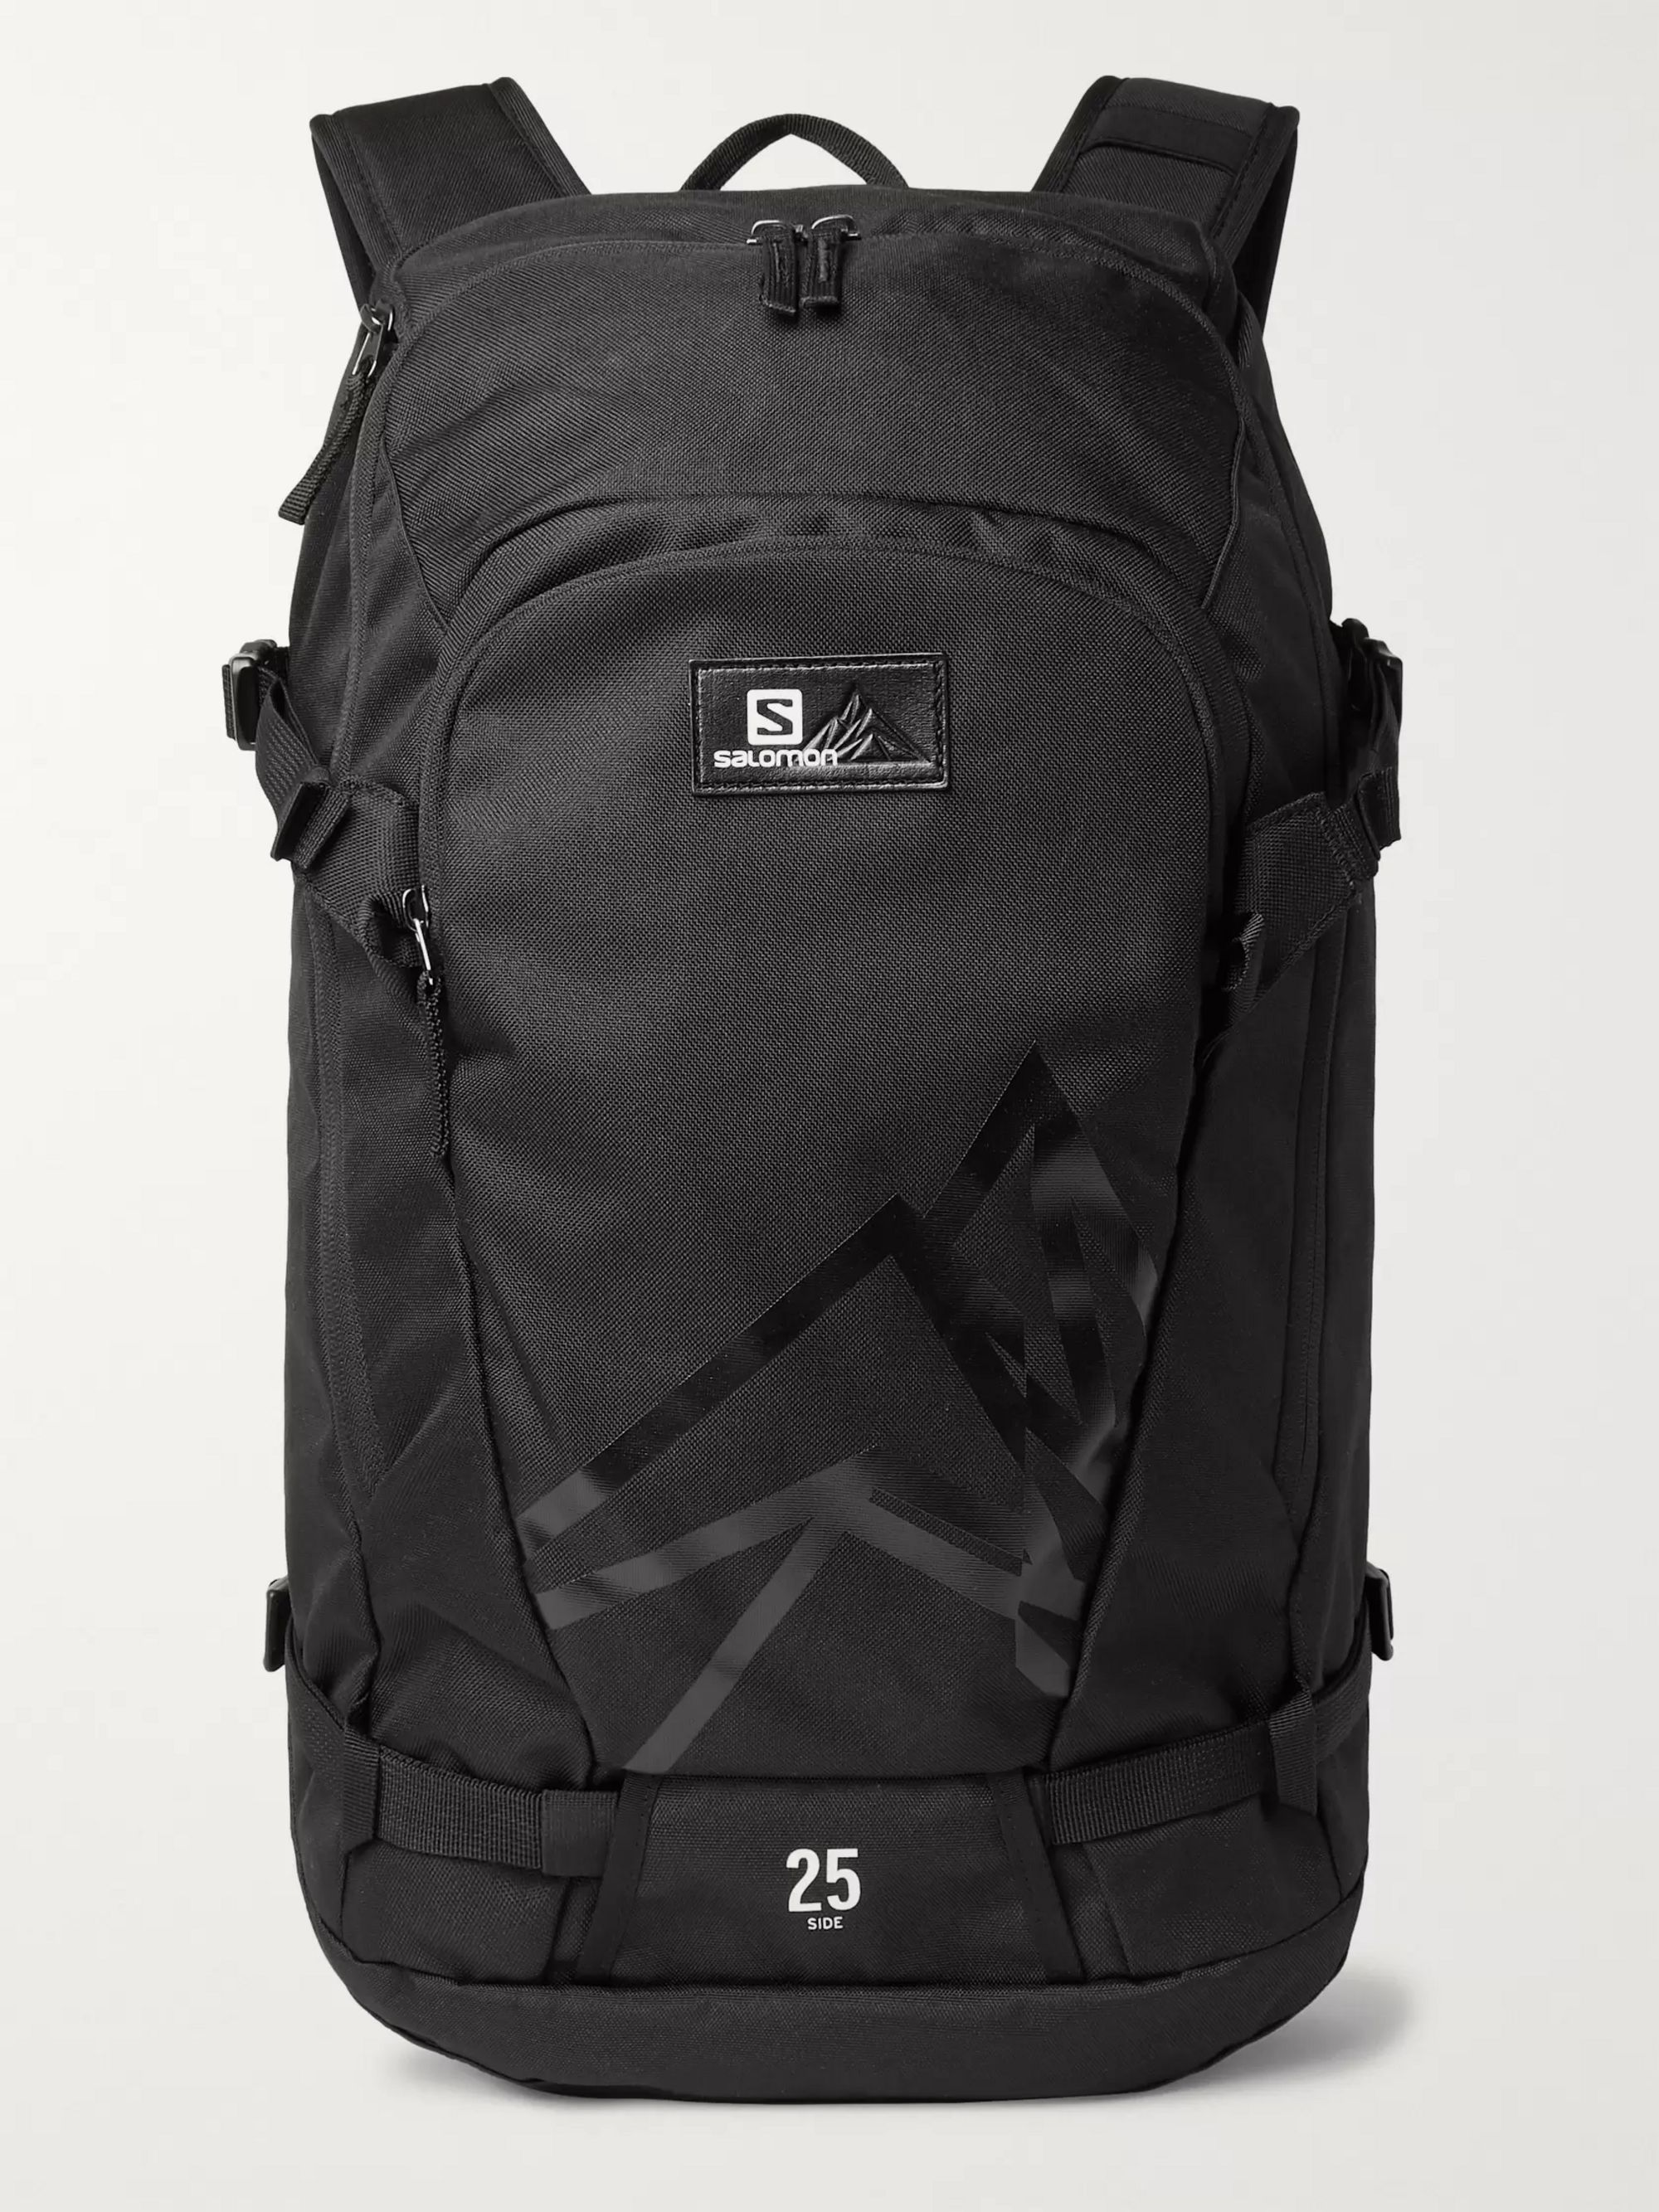 SALOMON Side 25 Lightweight Skiing Backpack